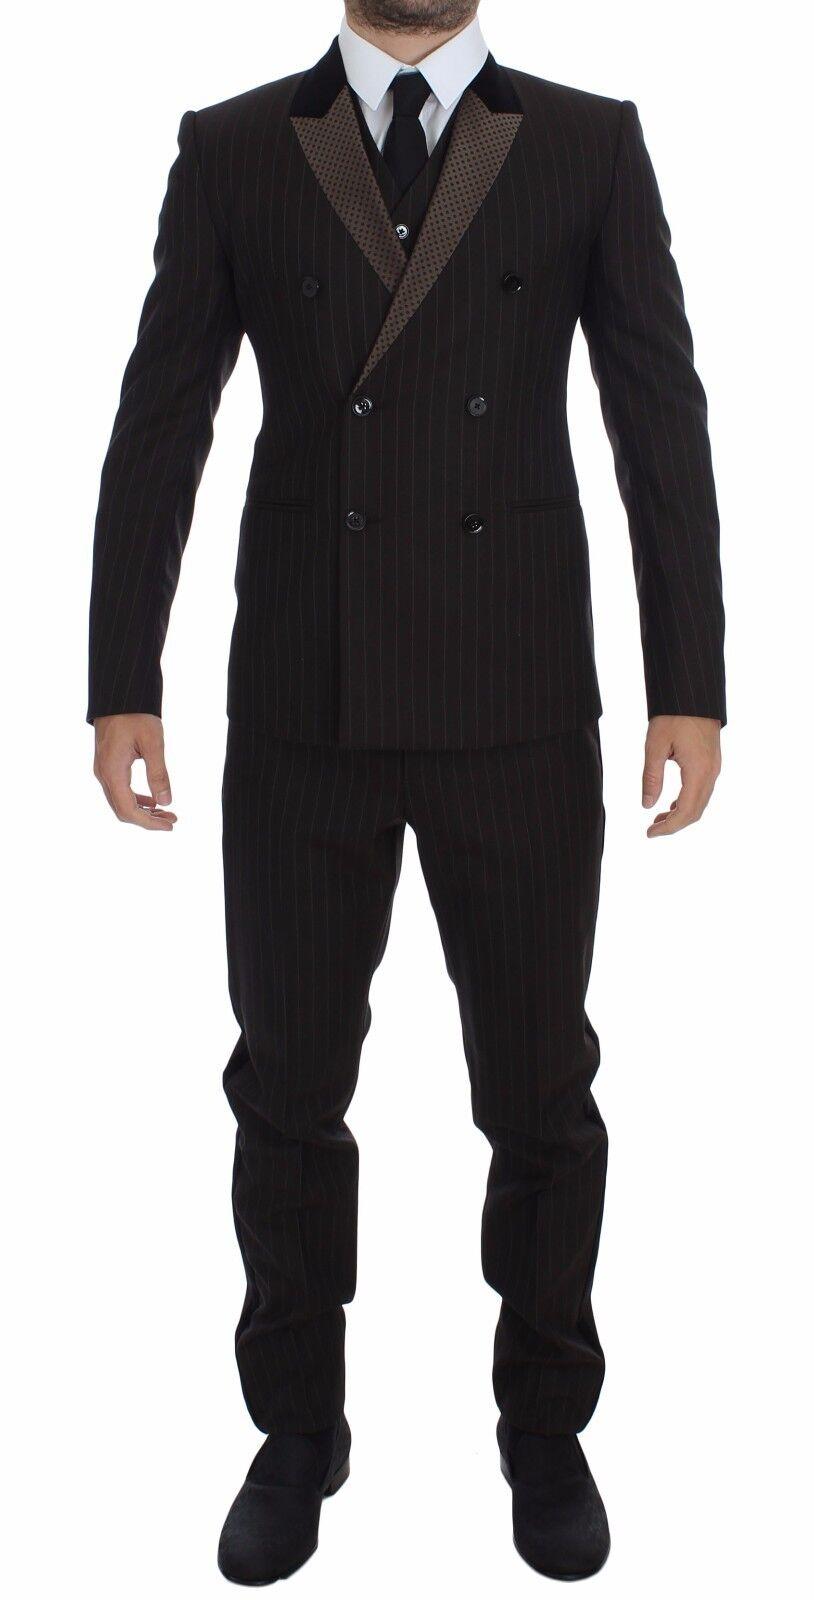 NWT DOLCE & GABBANA Braun Striped Wool Slim 3 Piece Suit Tuxedo EU48/ US38